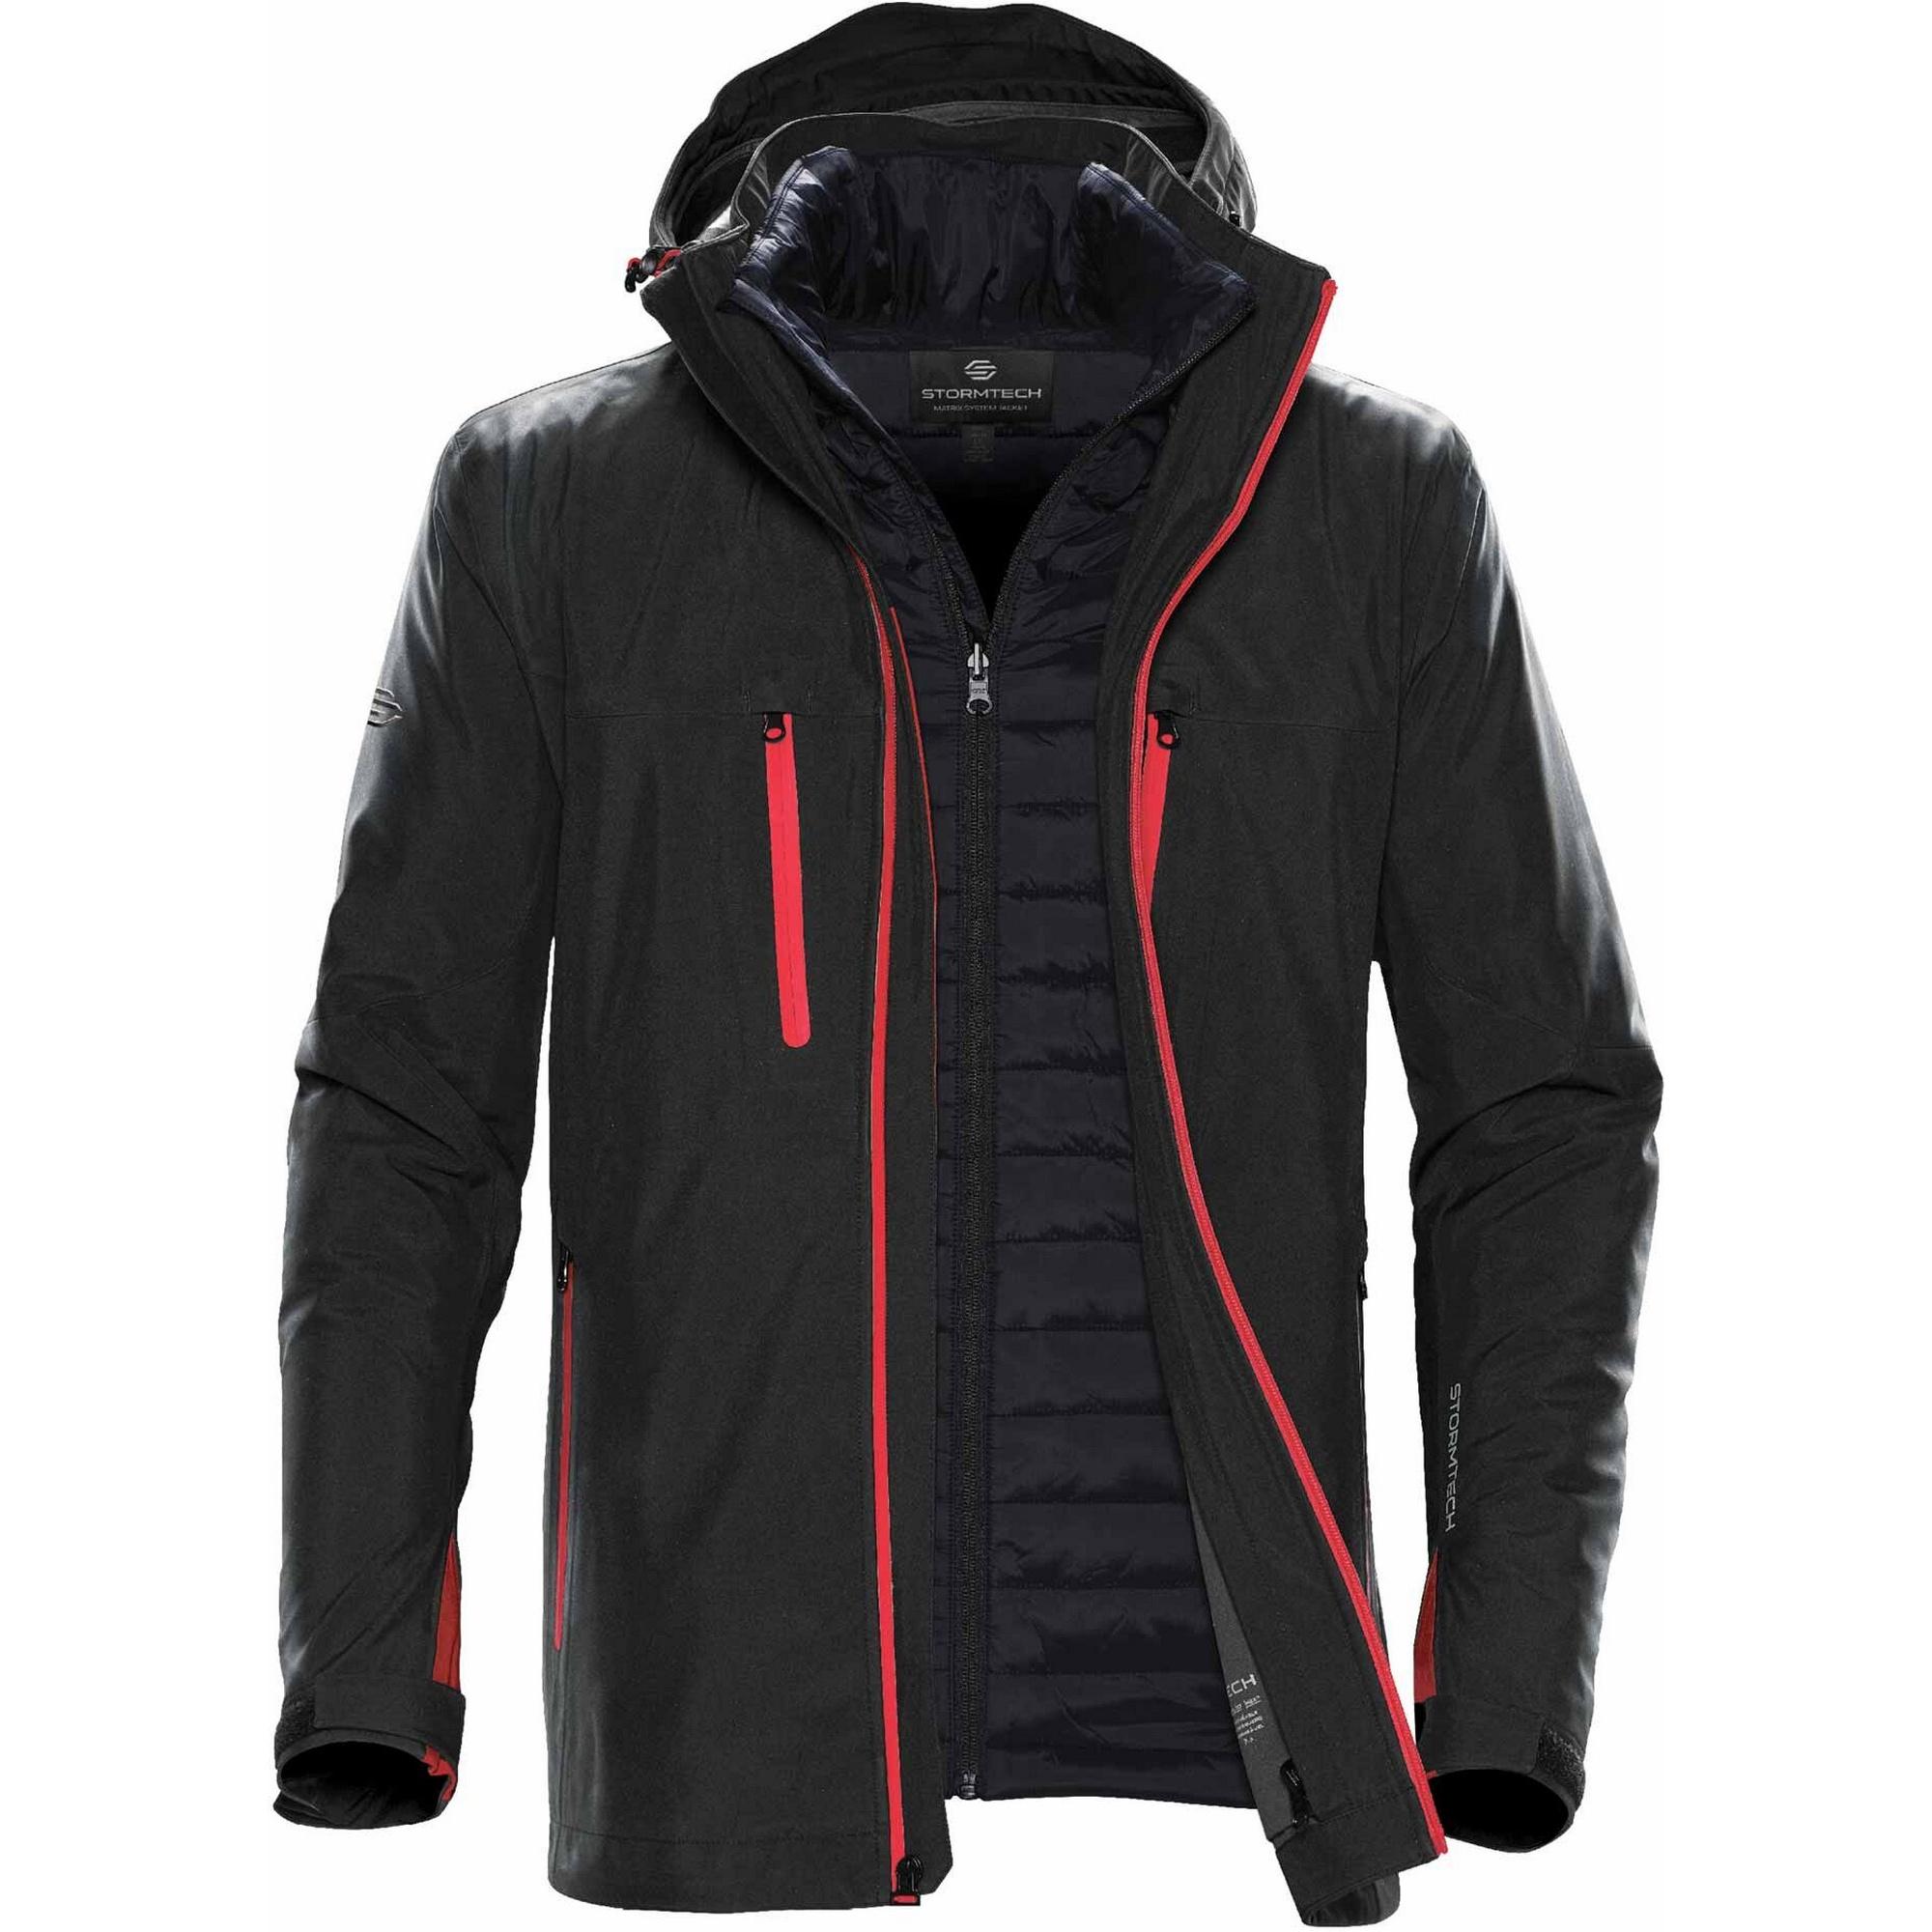 Stormtech Mens Matrix System Jacket (M) (Black/Red)